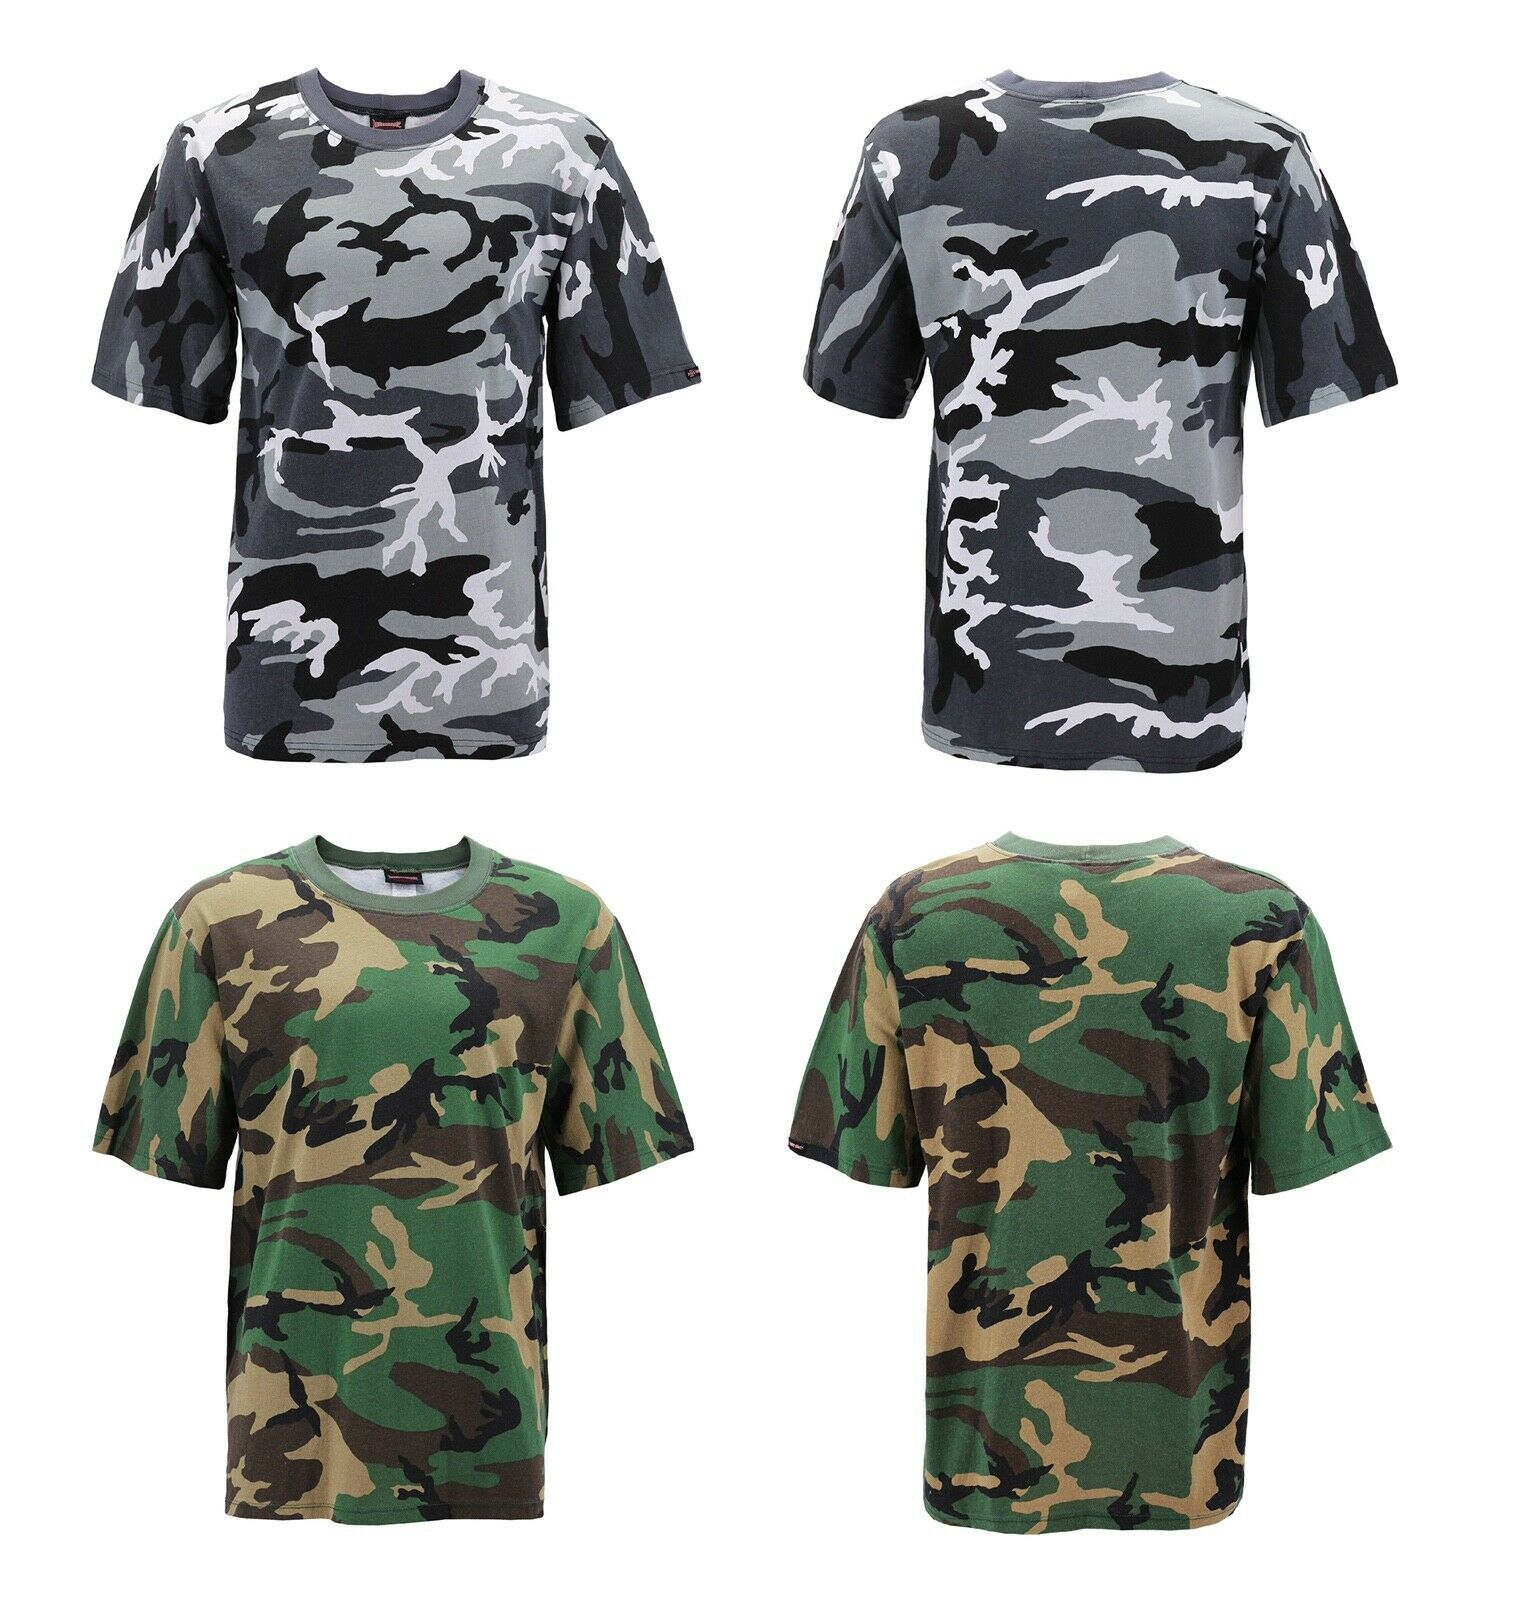 Men's Made in USA Crewneck Camo 100% Cotton Shirt Lightweight Army T-shirt